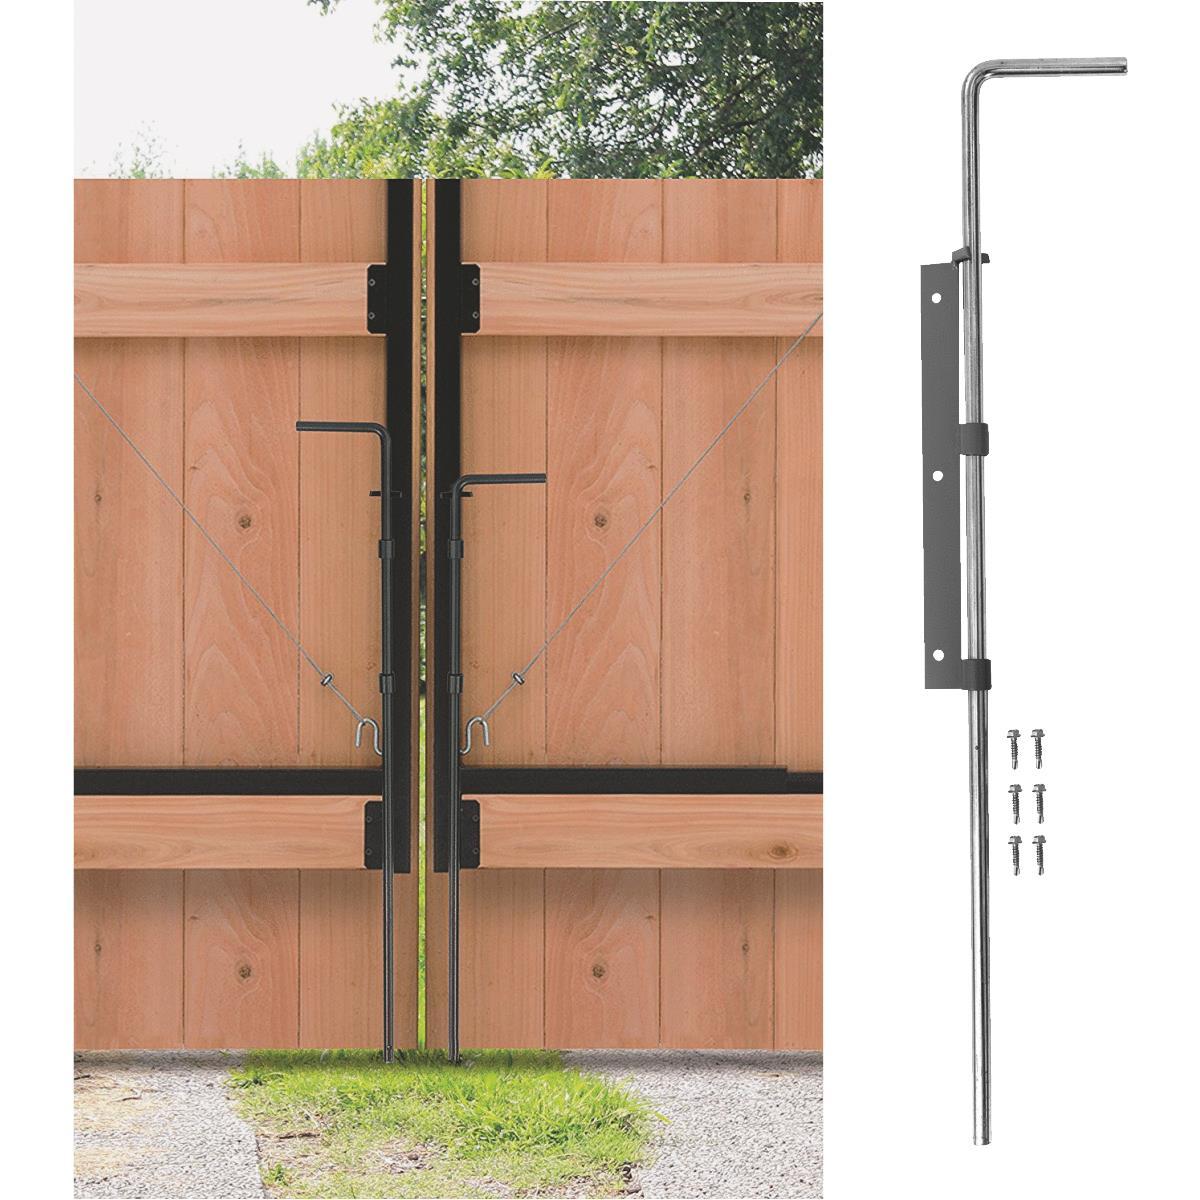 Buy Jewett Cameron Adjust A Gate Drop Rod Kit Cane Bolt Black